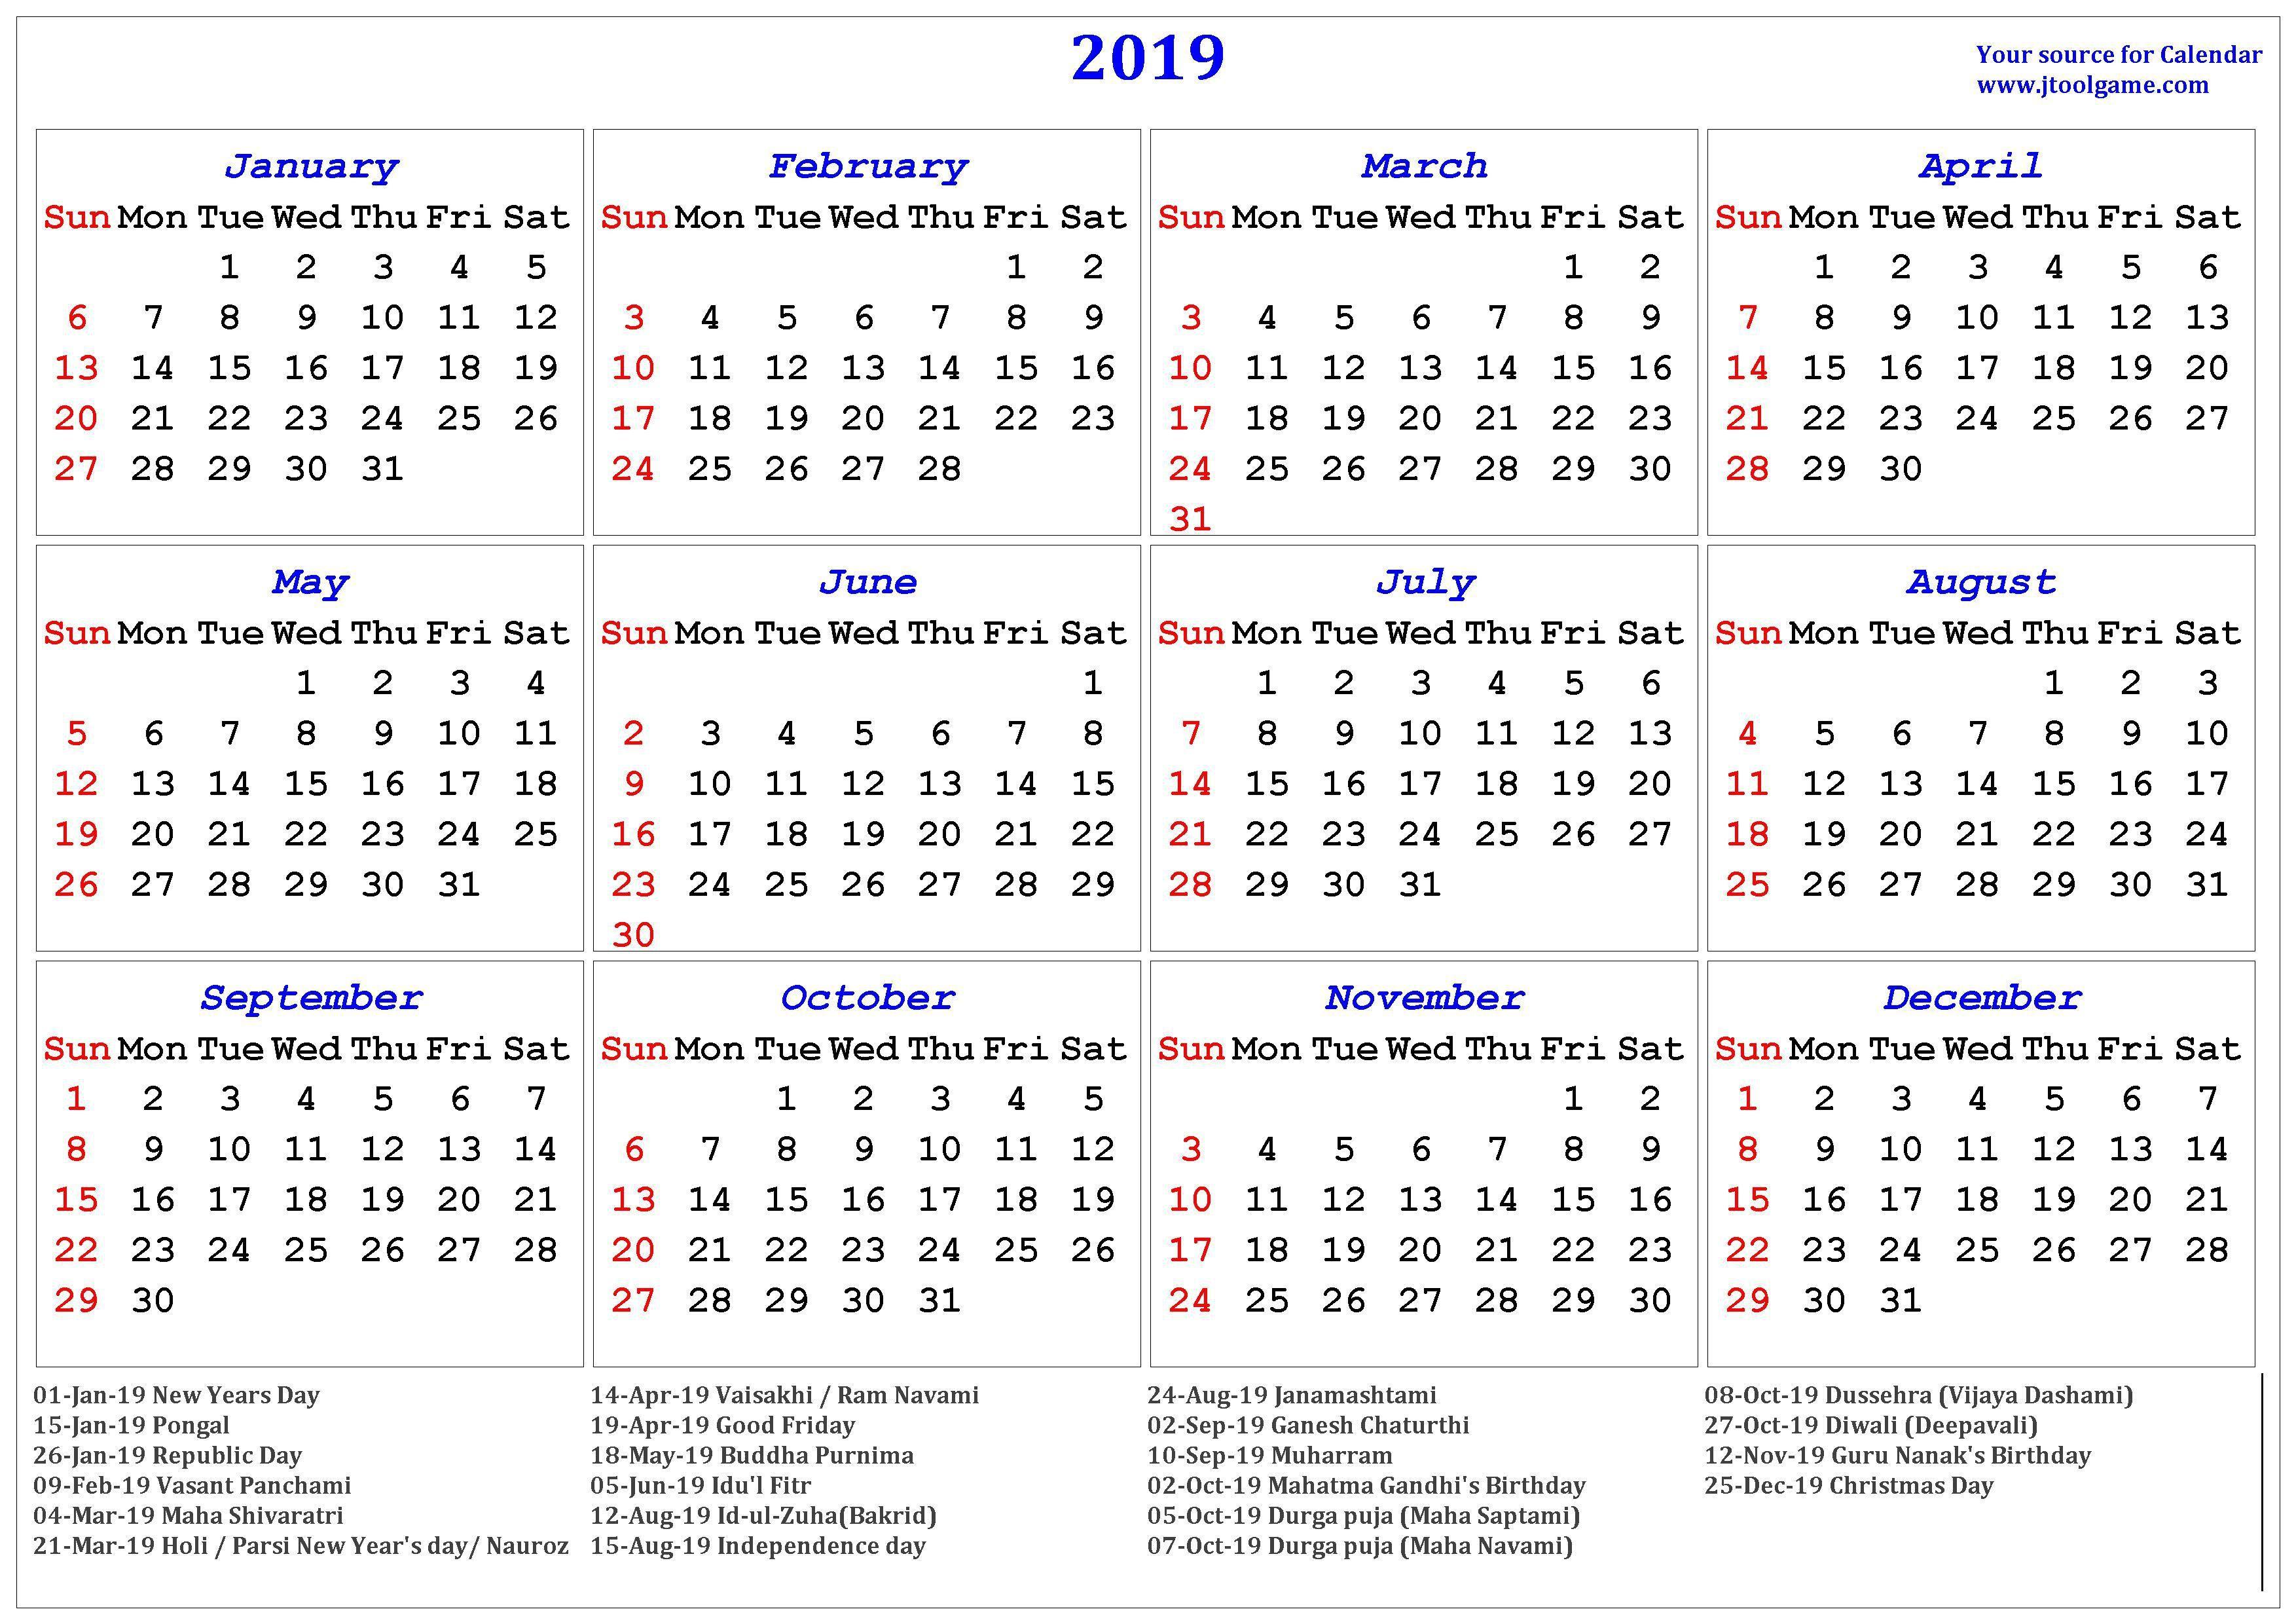 2019 Hindu Calendar With Tithi | Tyohar, Holidays, Festivals